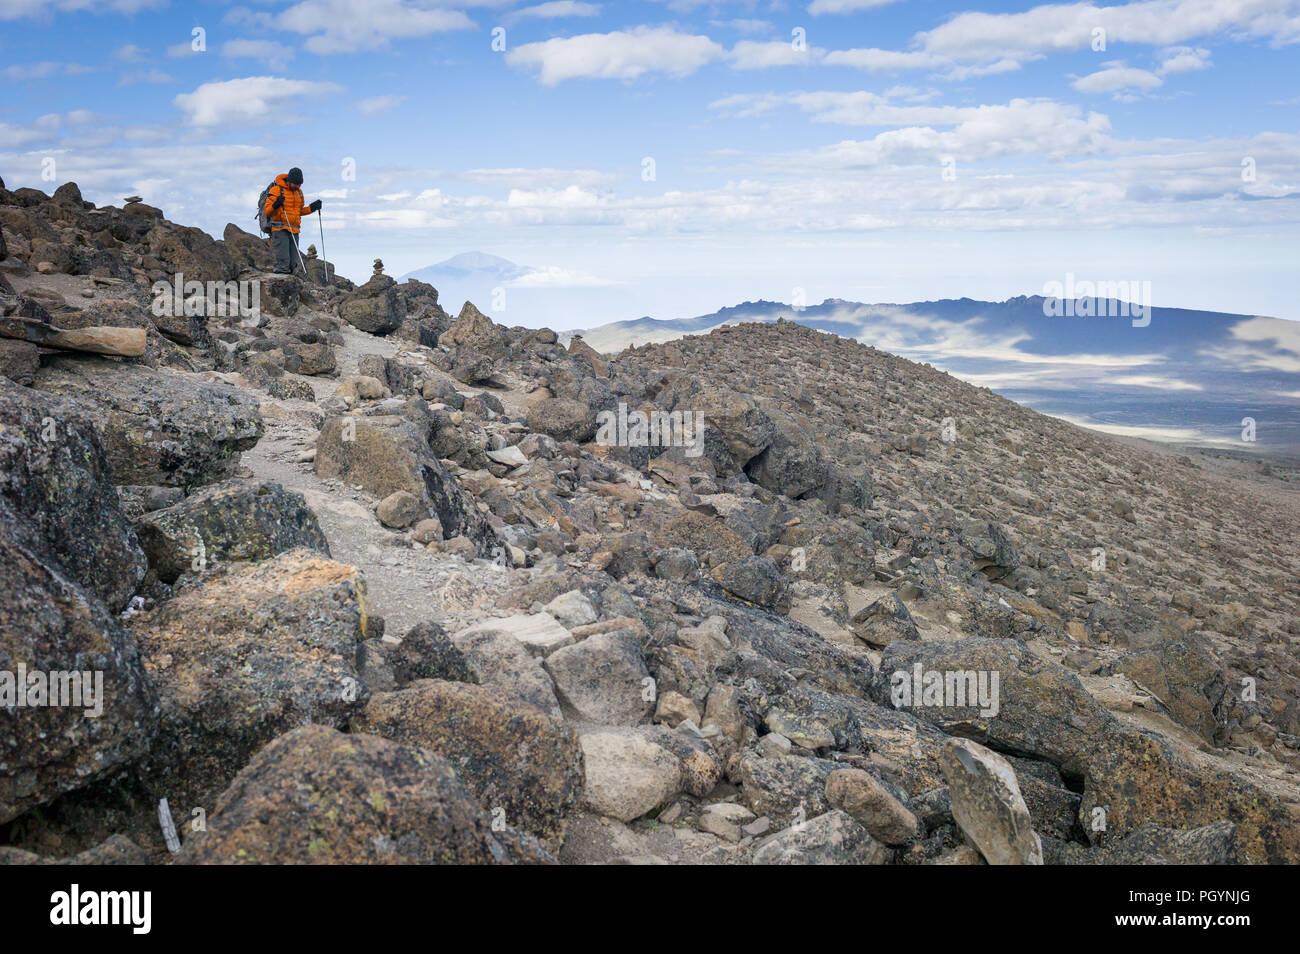 Hiker on northern circuit, with Mount Meru in the background, Mount Kilimanjaro, Kilimanjaro Region, Tanzania. - Stock Image